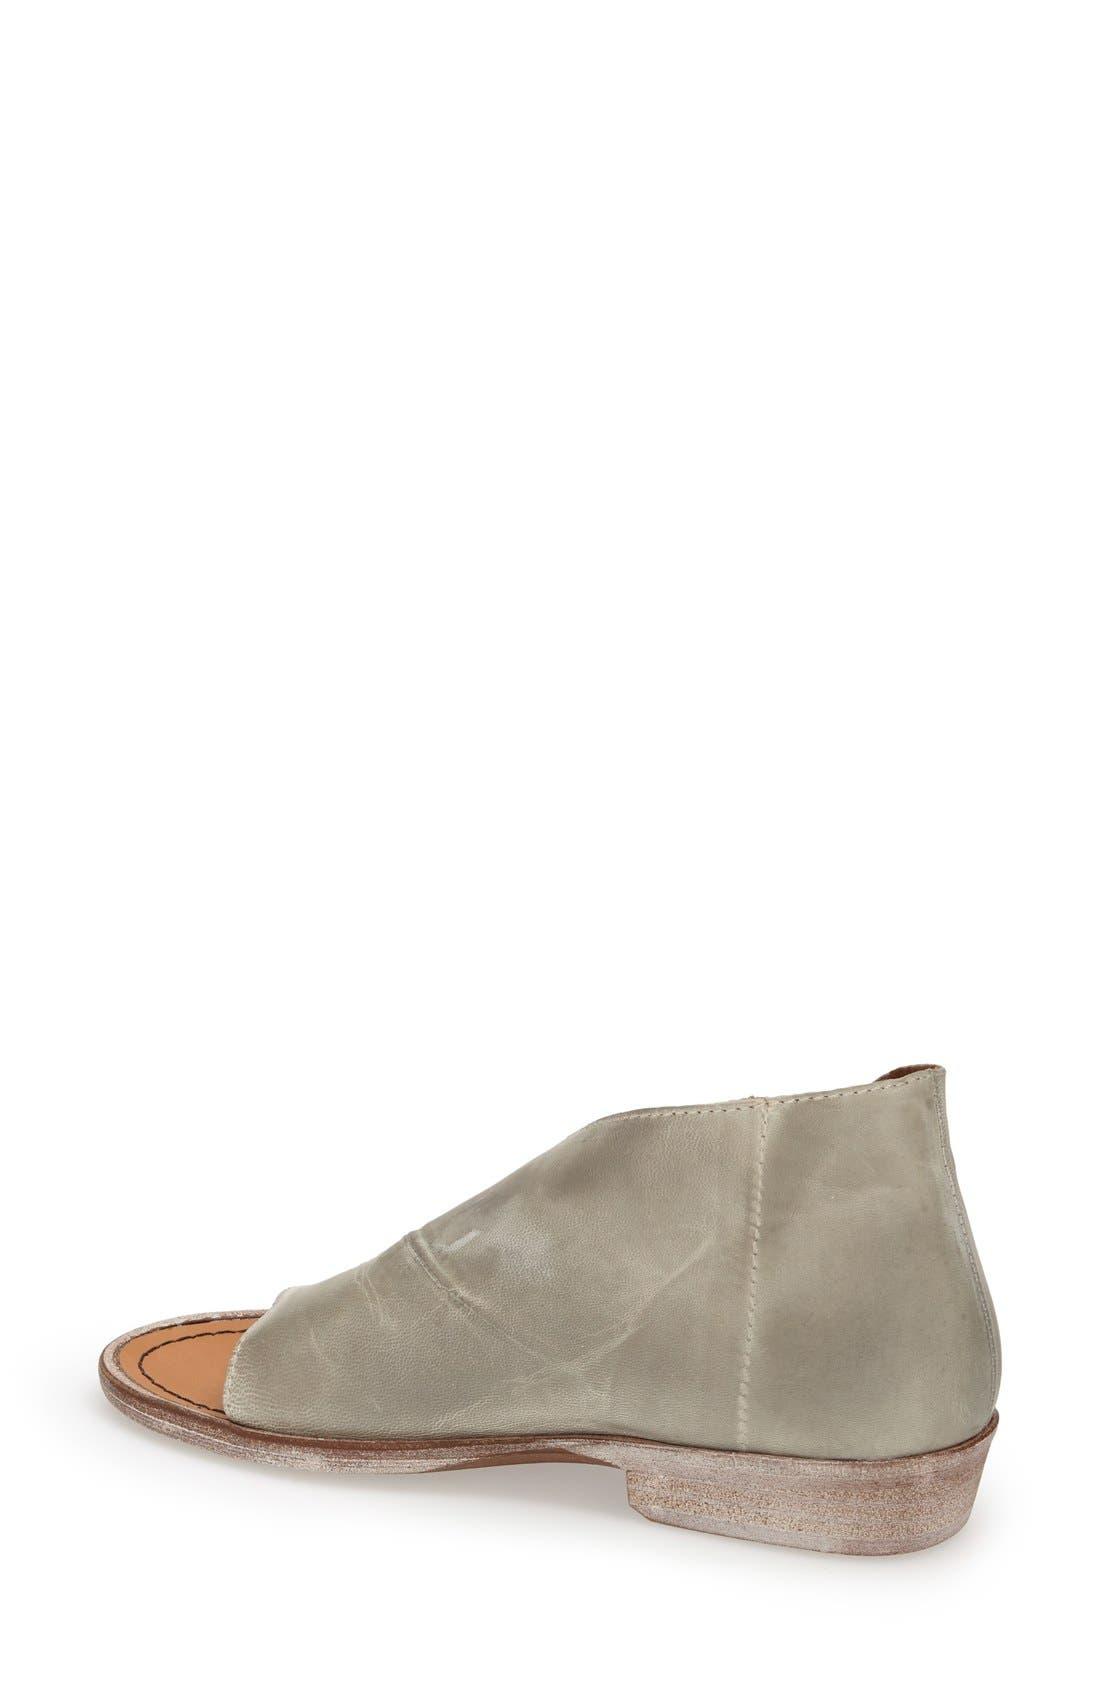 'Mont Blanc' Asymmetrical Sandal,                             Alternate thumbnail 21, color,